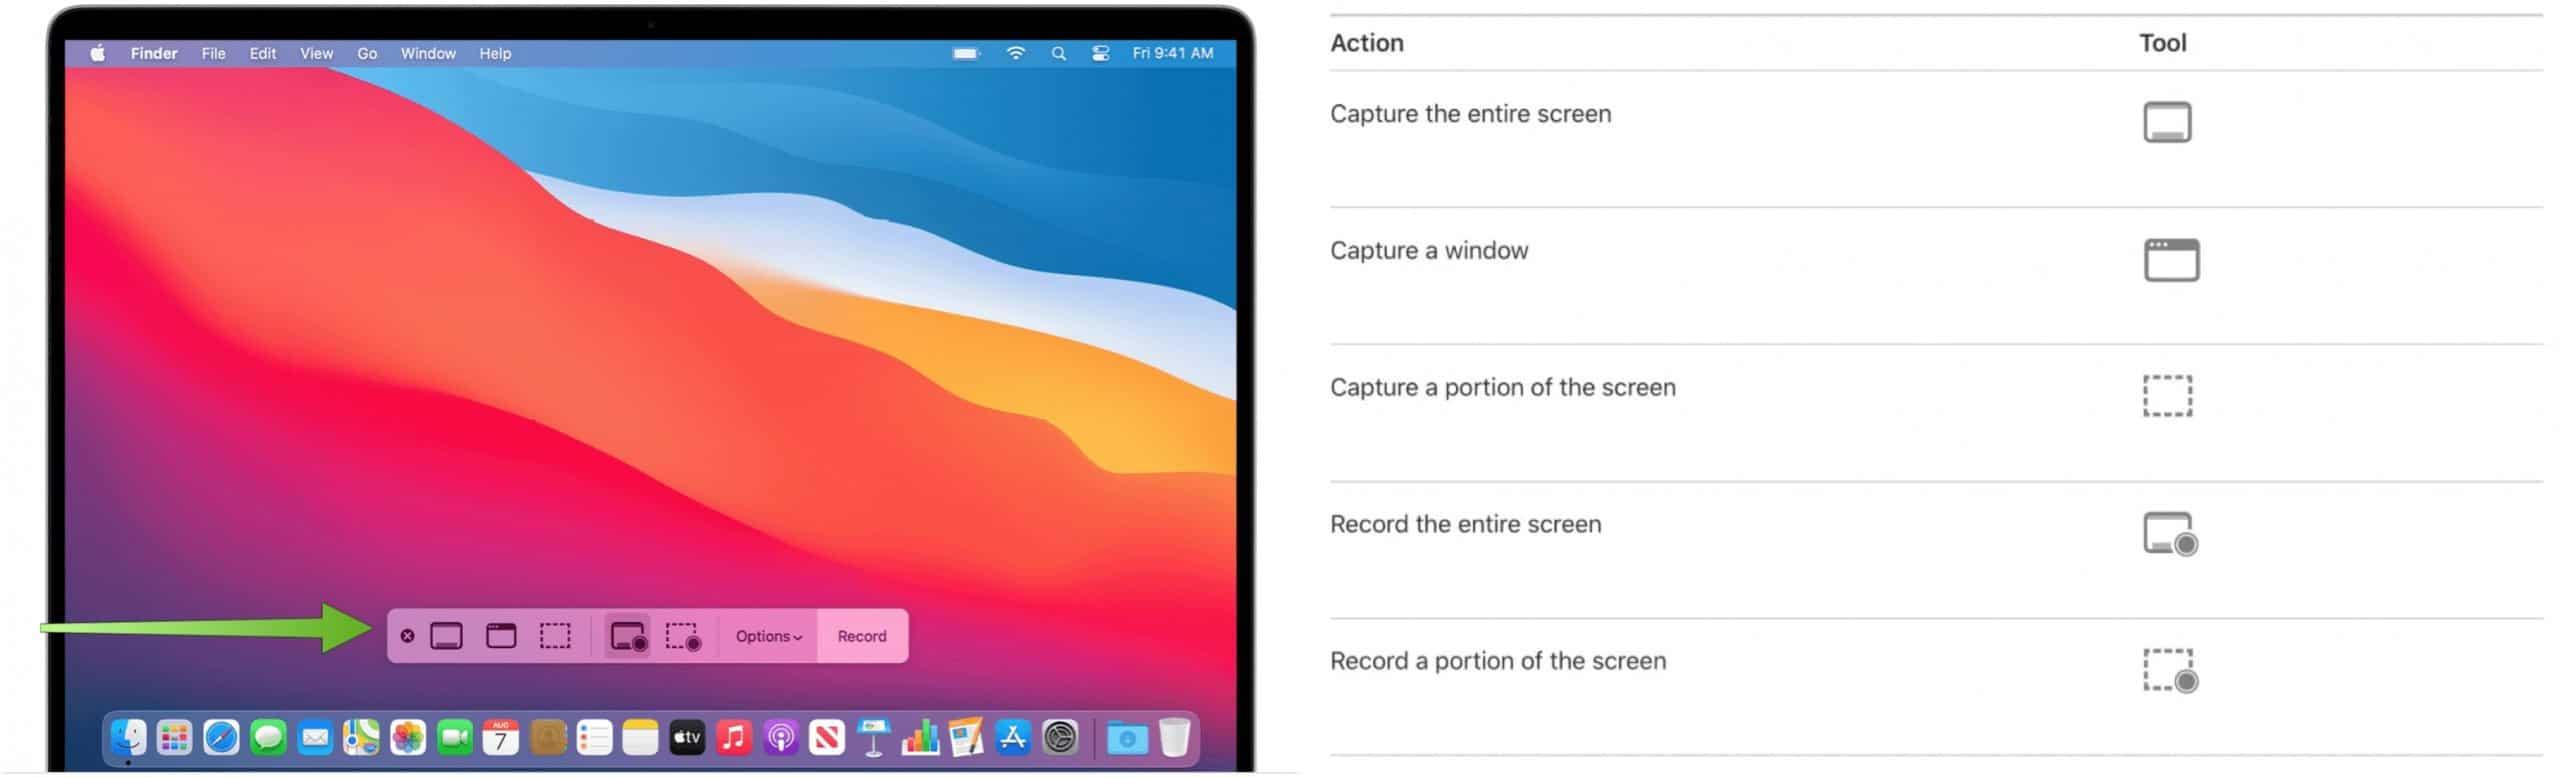 Mac Screenshot tool